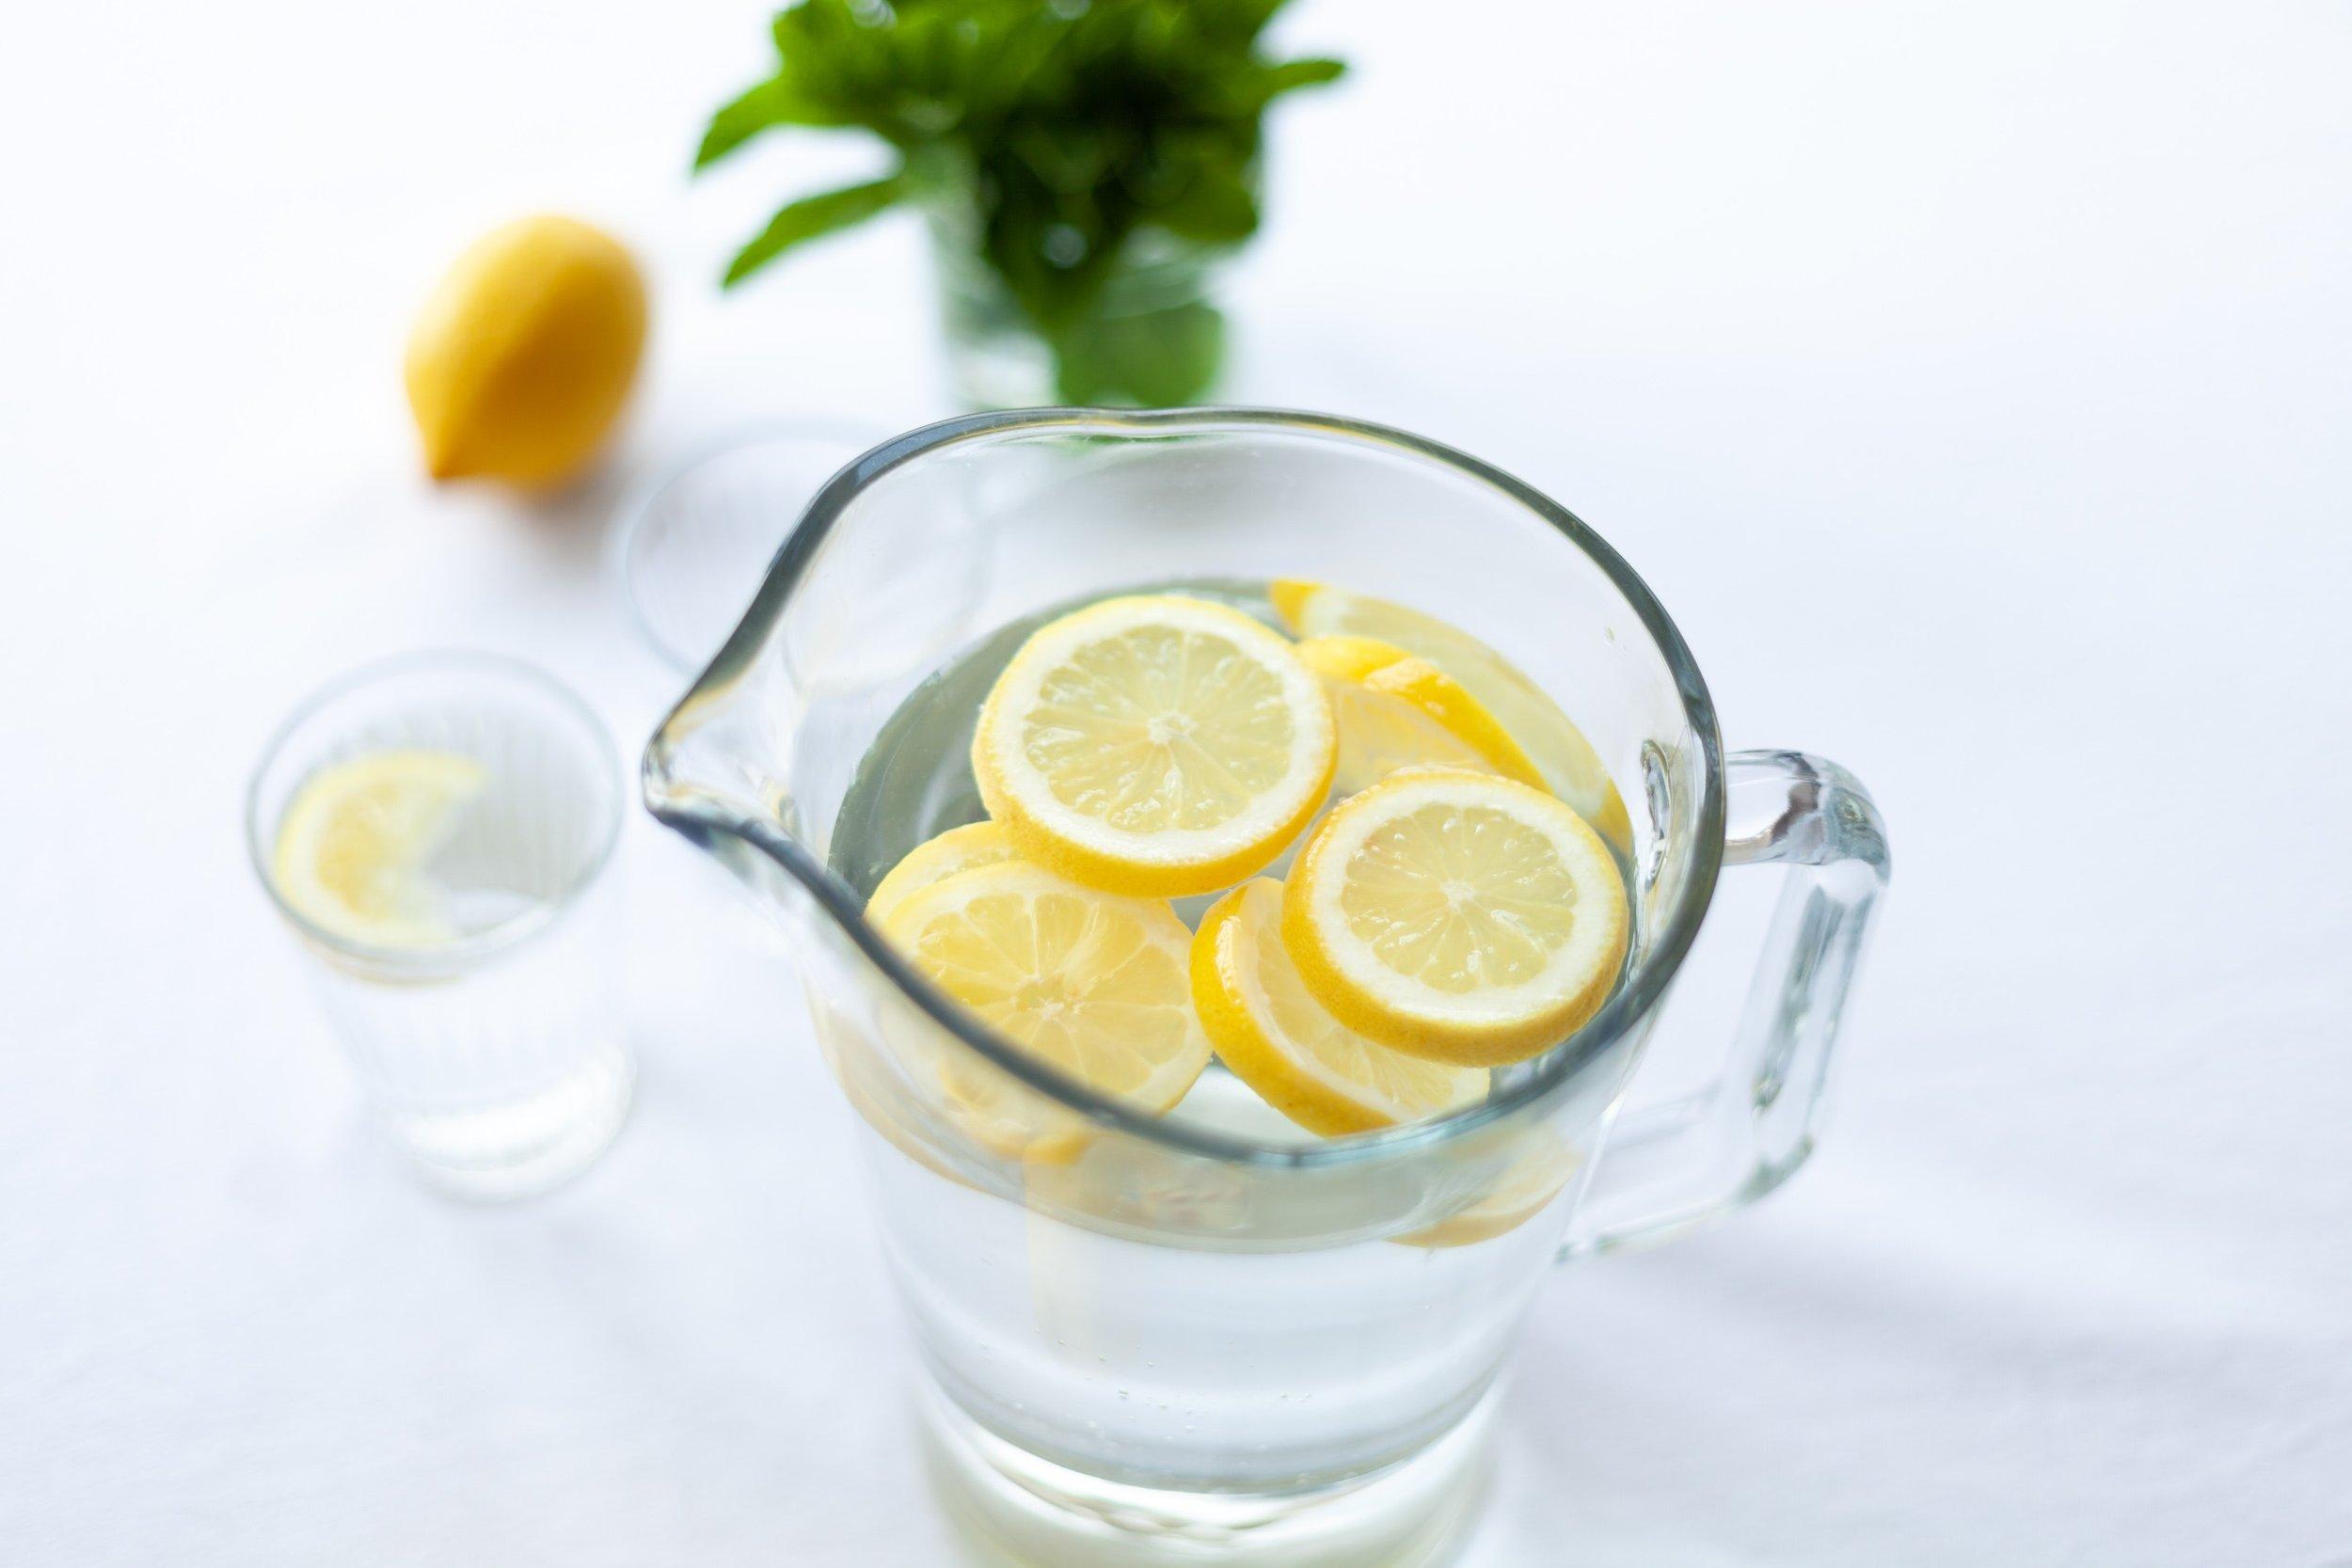 citrus-close-up-drink-1320998.jpg